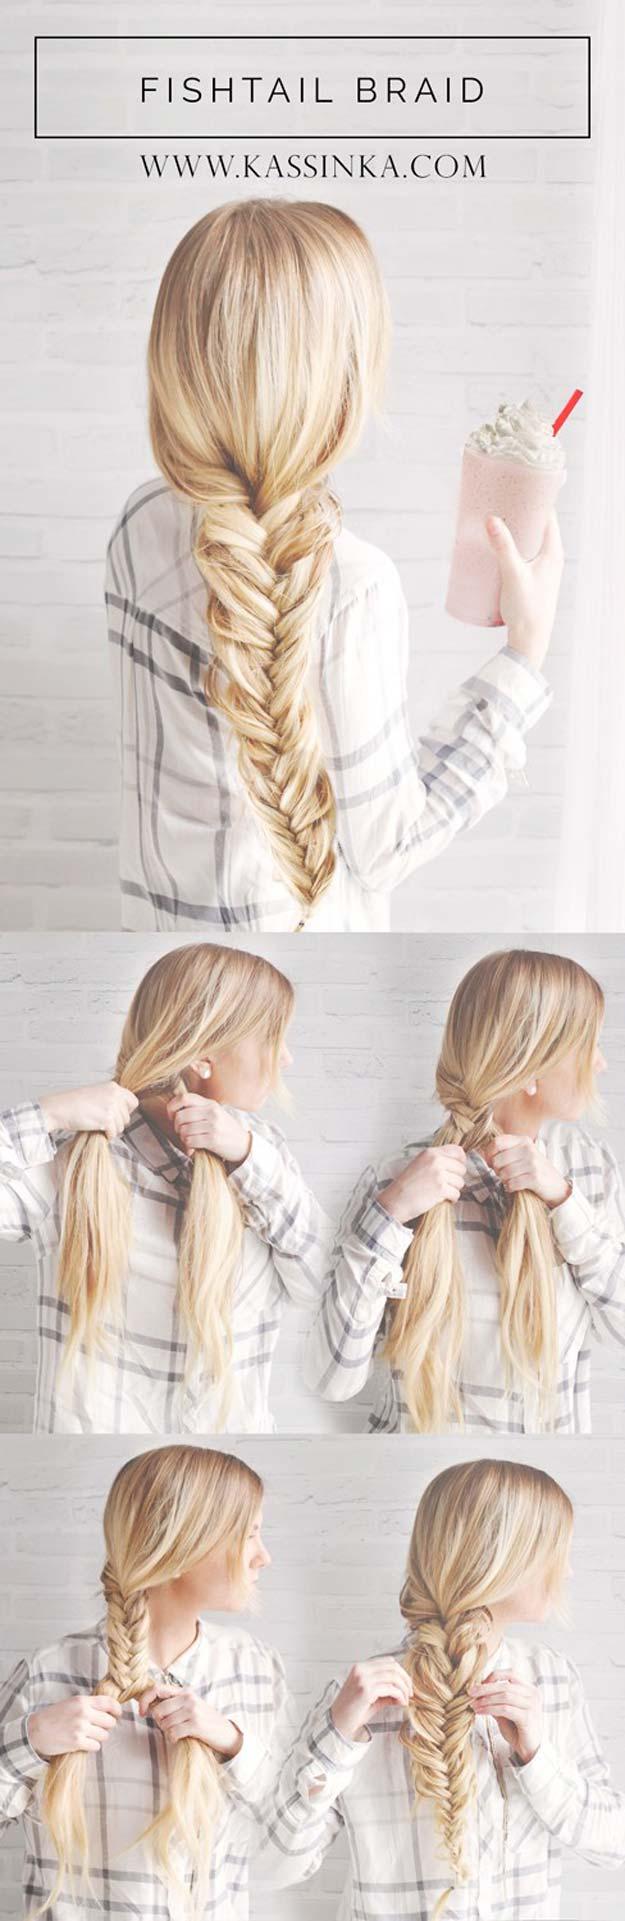 Best Hair Braiding Tutorials - Fishtail Braid 101 - Easy Step by Step Tutorials for Braids - How To Braid Fishtail, French Braids, Flower Crown, Side Braids, Cornrows, Updos - Cool Braided Hairstyles for Girls, Teens and Women - School, Day and Evening, Boho, Casual and Formal Looks #hairstyles #braiding #braidingtutorials #diyhair